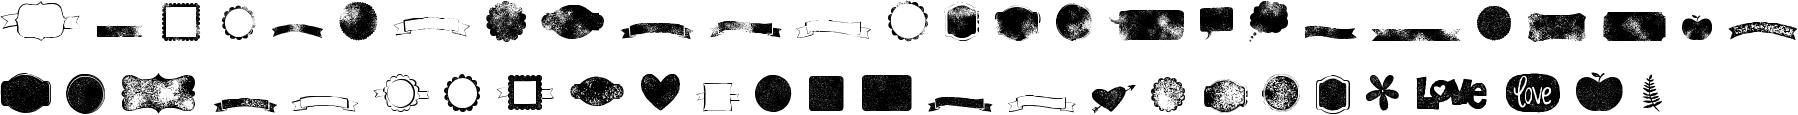 Kgflavorandframesseven Character Map Image